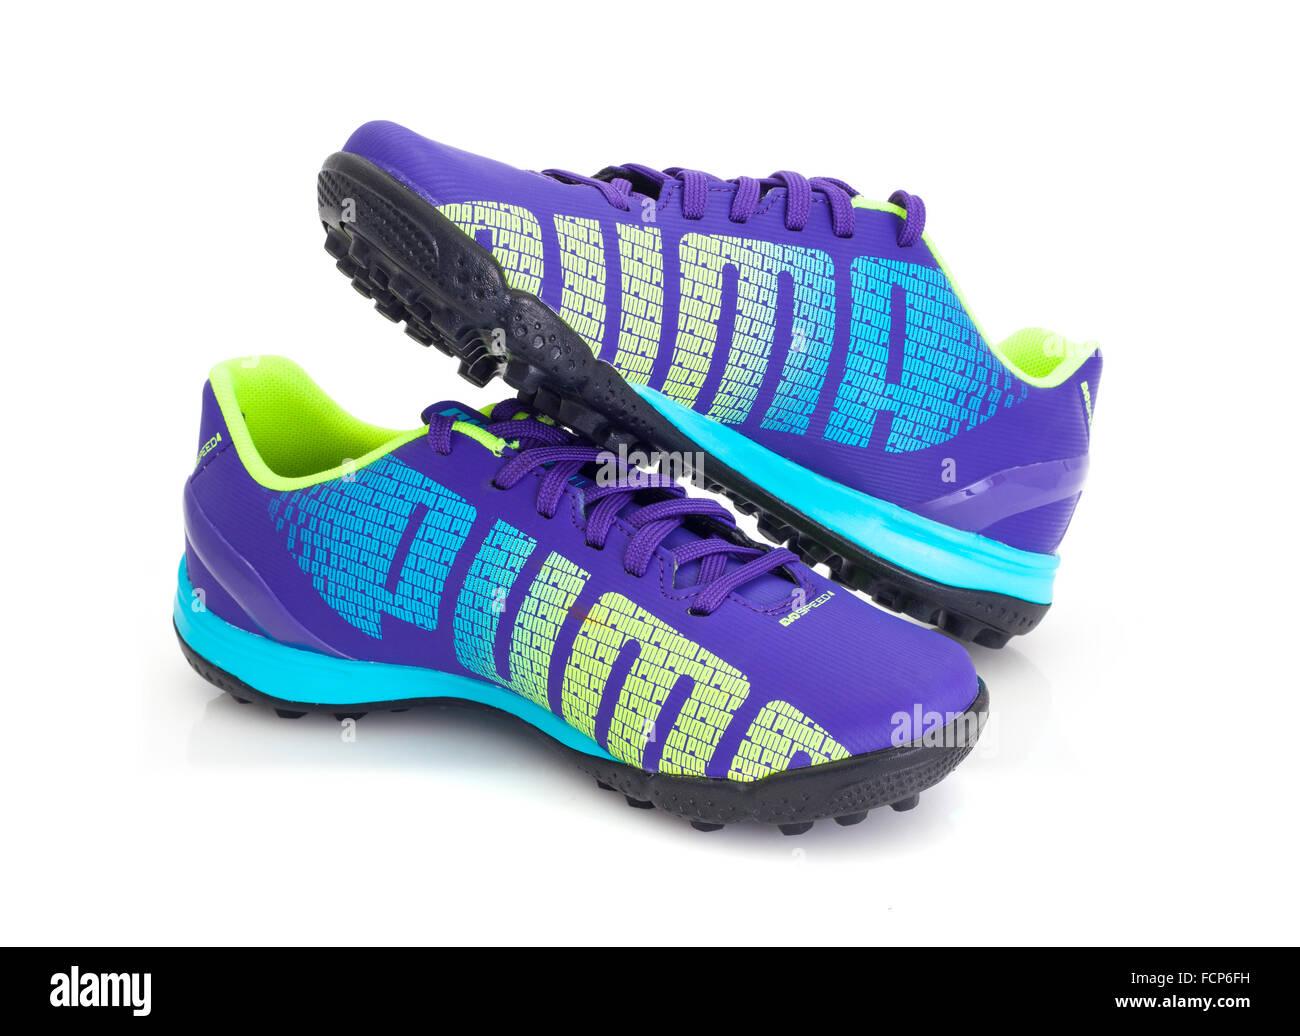 Puma Evospeed botas de fútbol 4 sobre un fondo blanco. Imagen De Stock 2adce7474d4f6